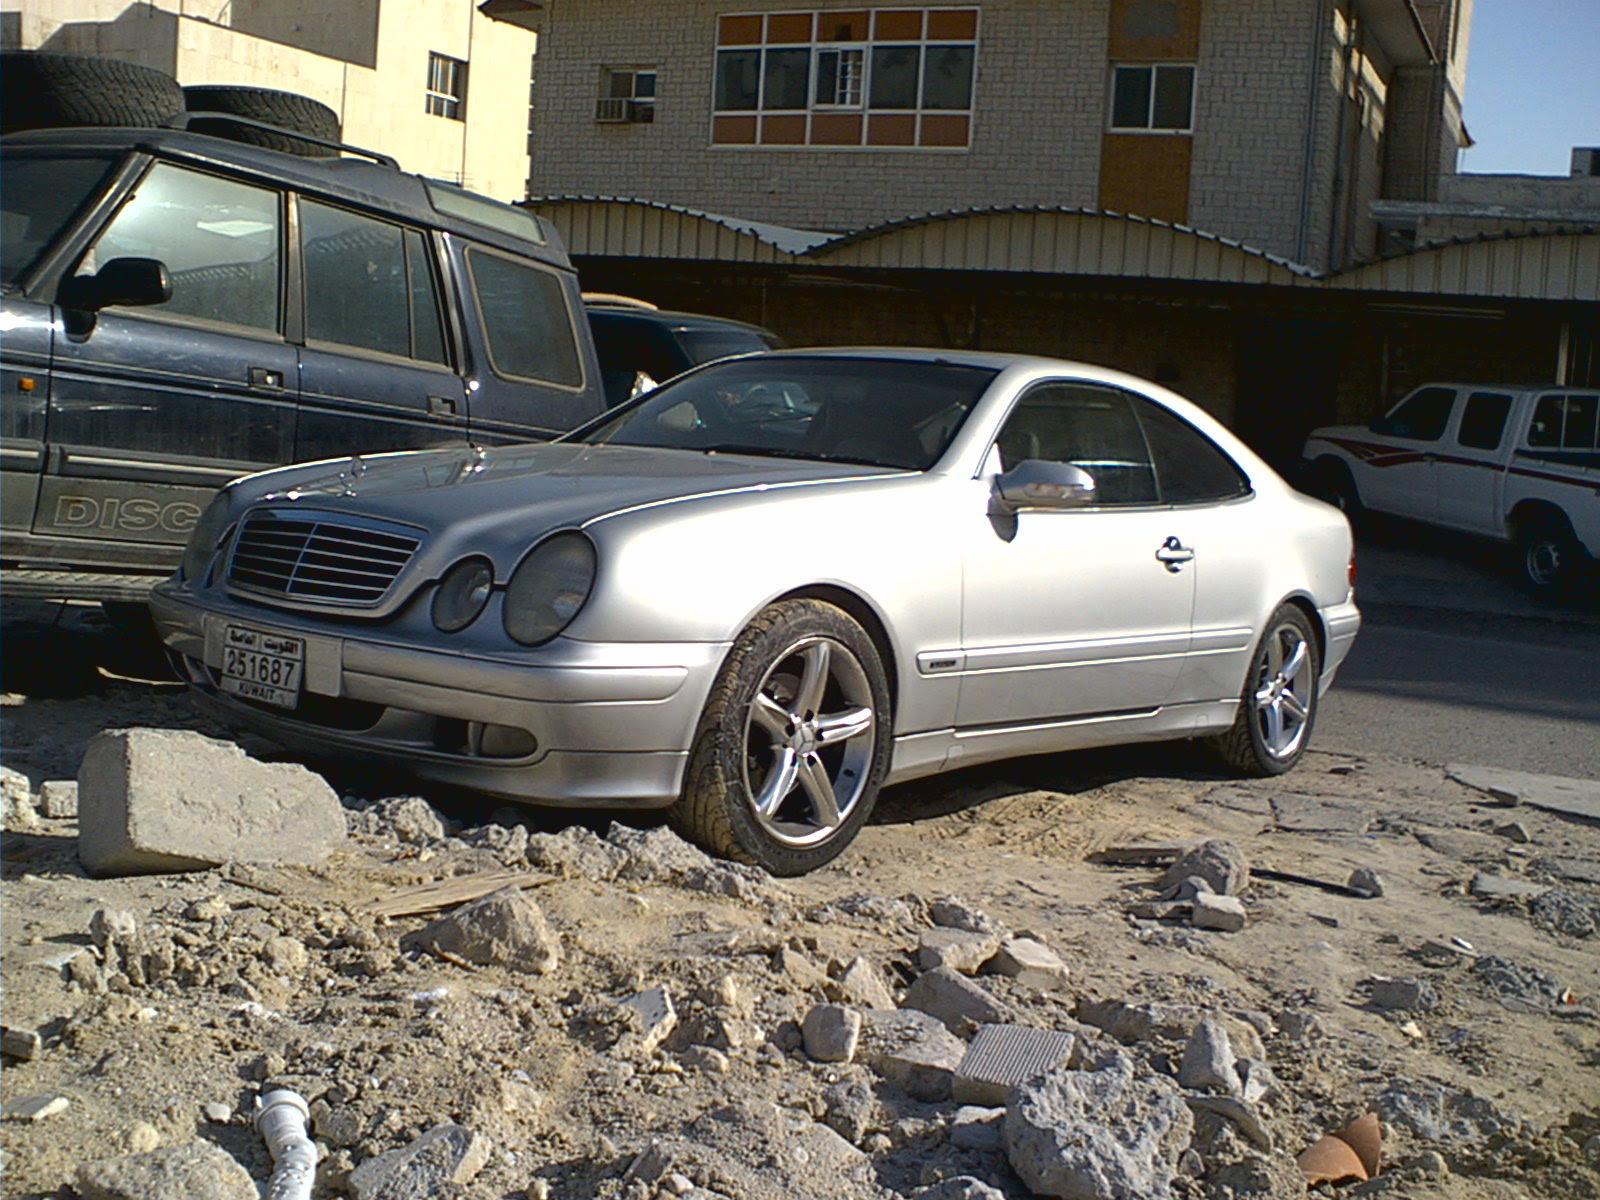 2001 Mercedes-Benz CLK-Class - Pictures - CarGurus